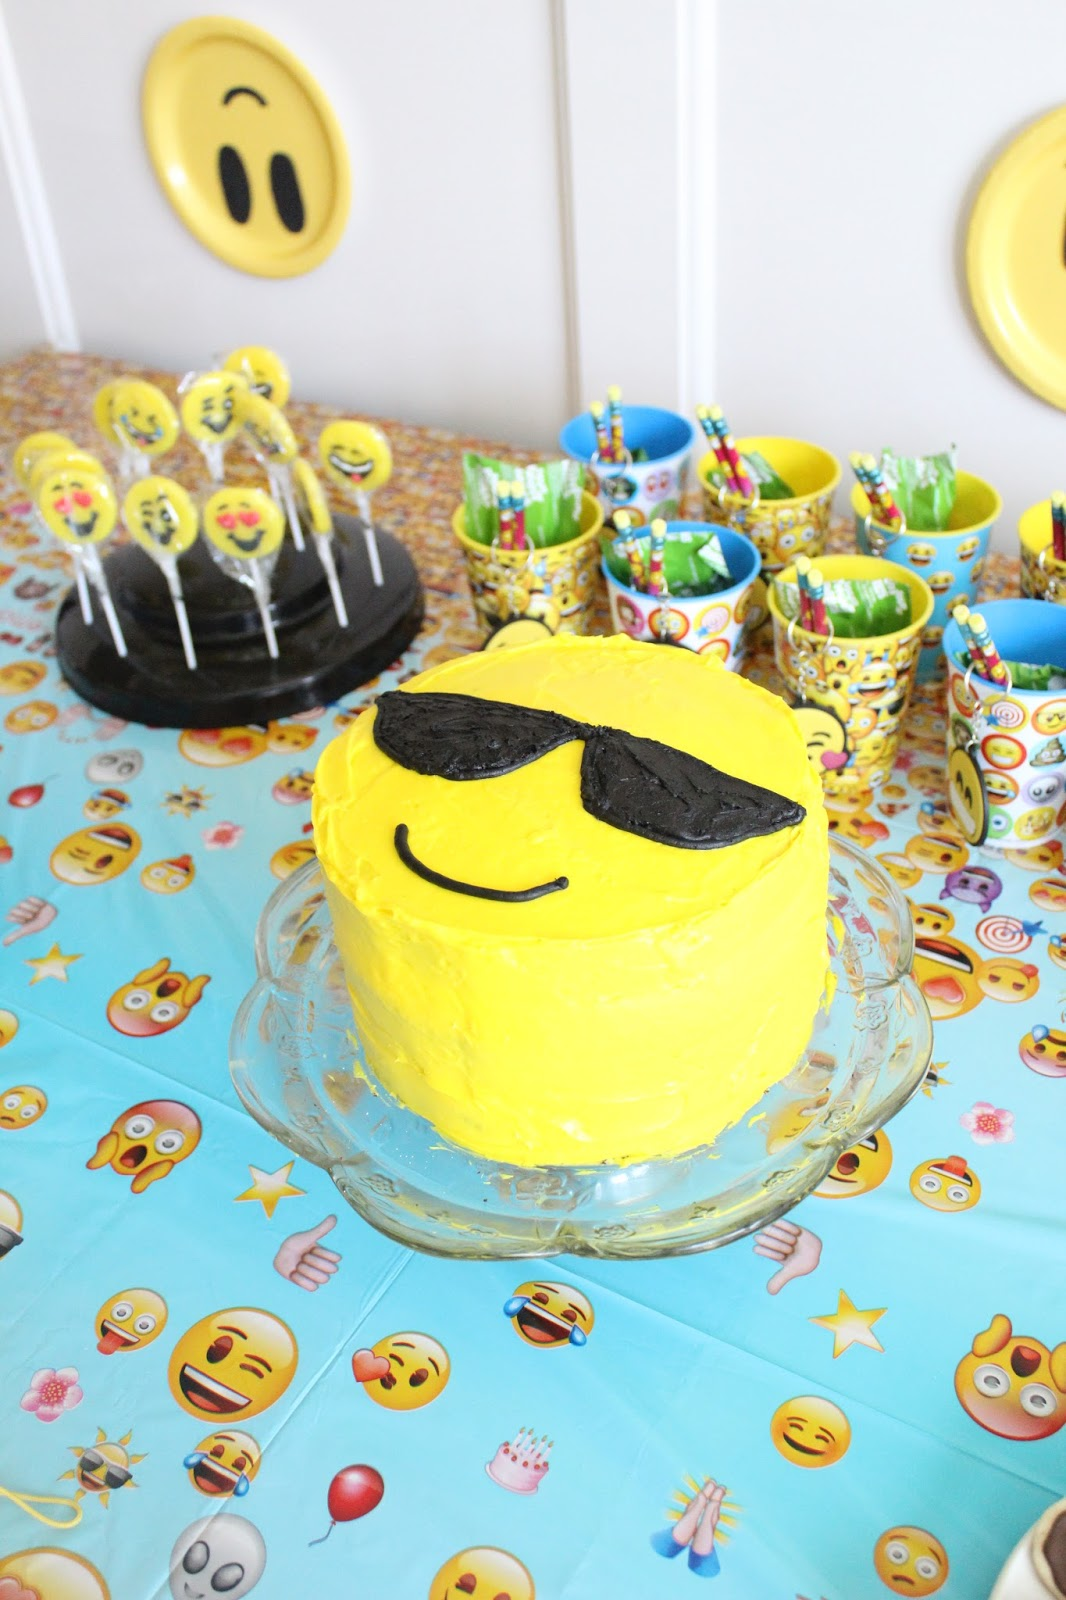 DIY easy emoji cake